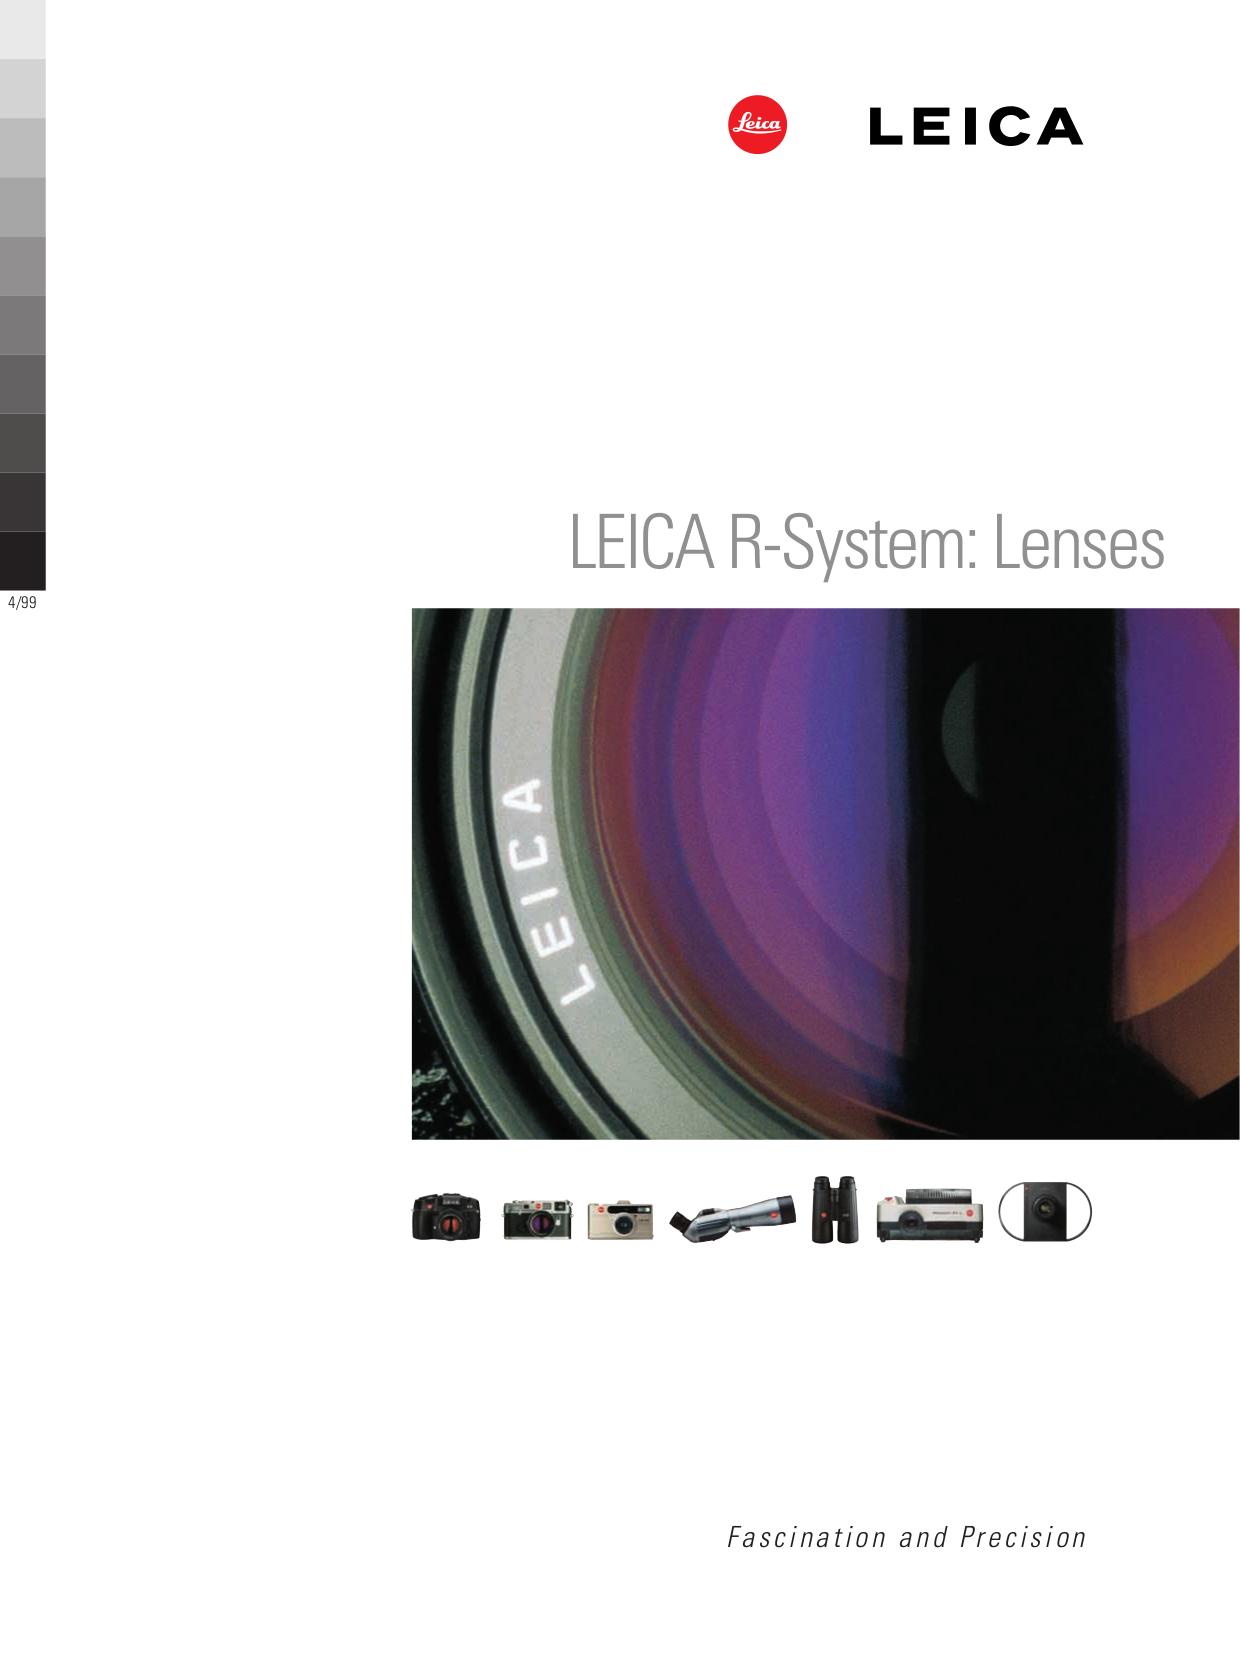 leica digilux 3 manual pdf